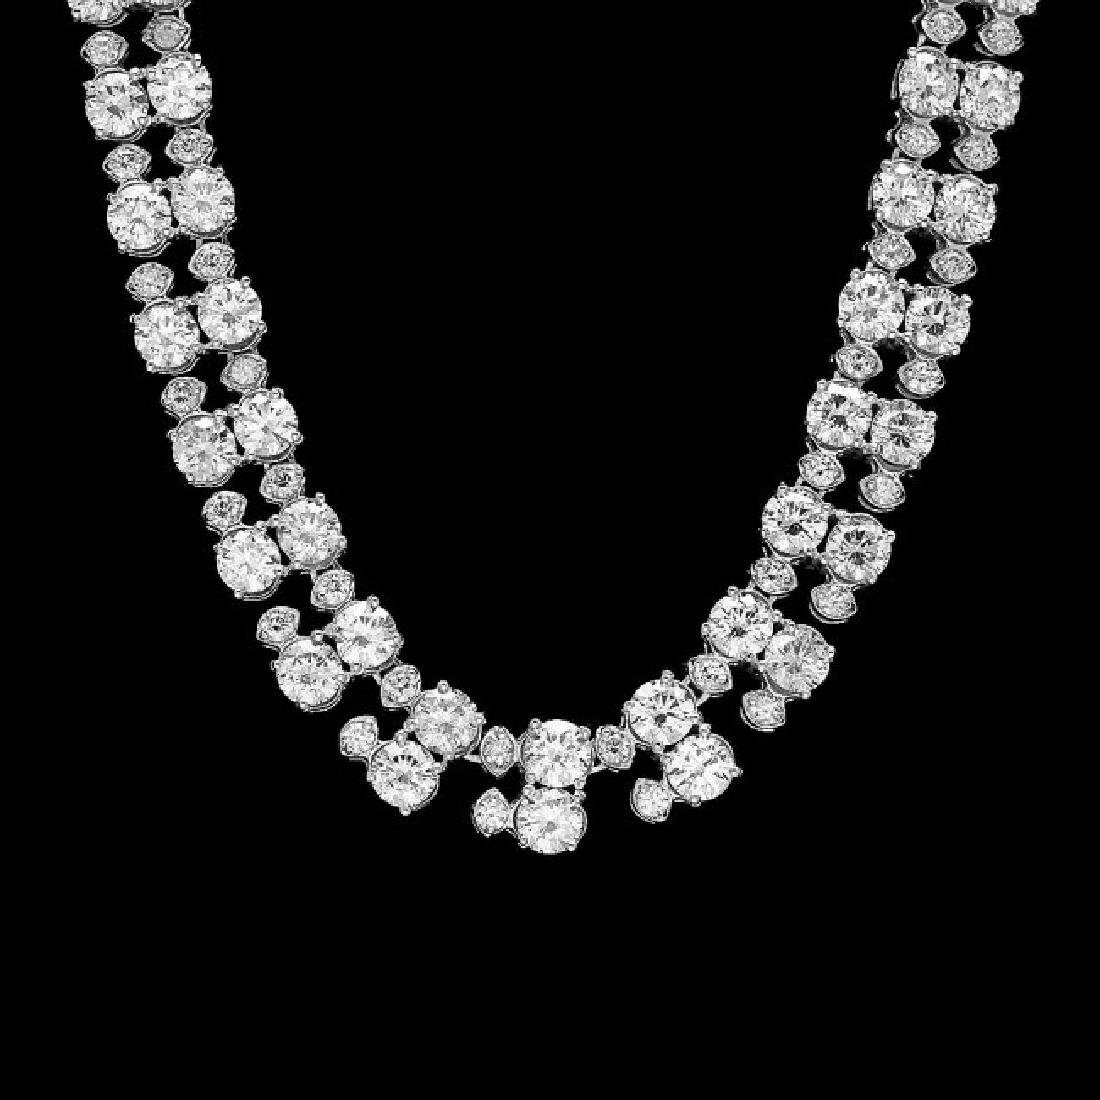 18k White Gold 24ct Diamond Necklace